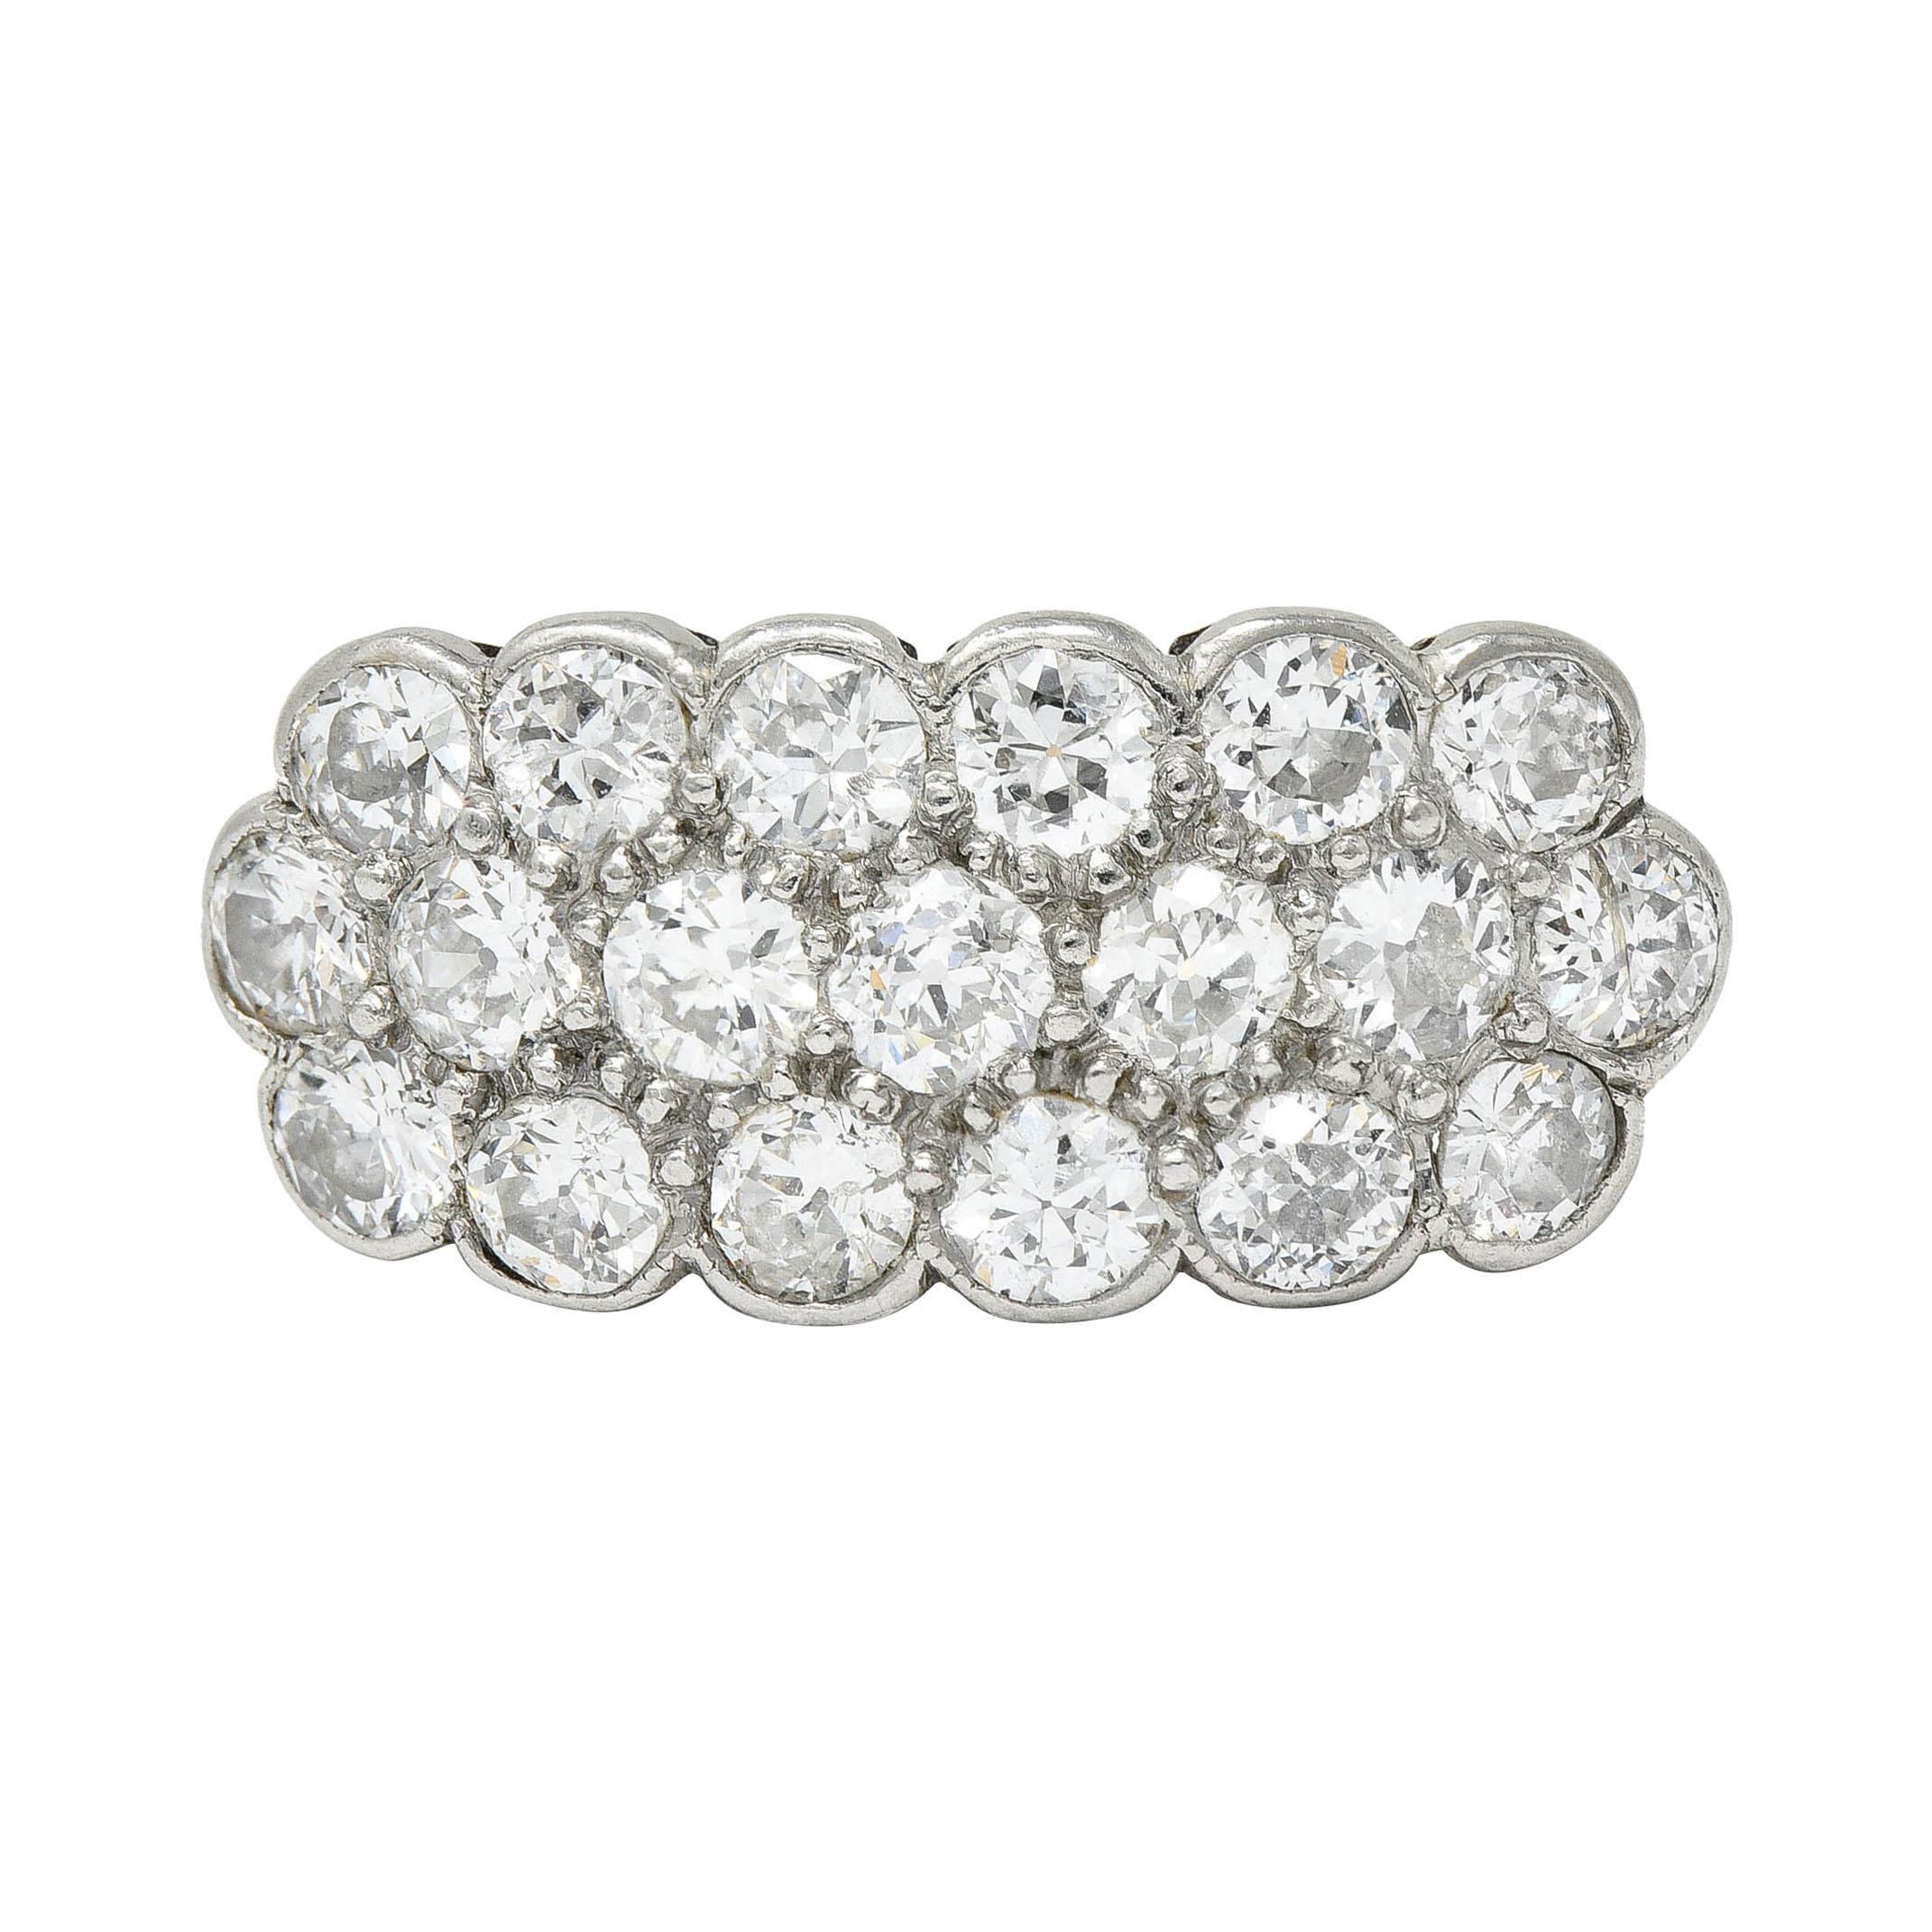 Edwardian 2.00 Carats Diamond Platinum-Topped 14 Karat Gold Cluster Band Ring